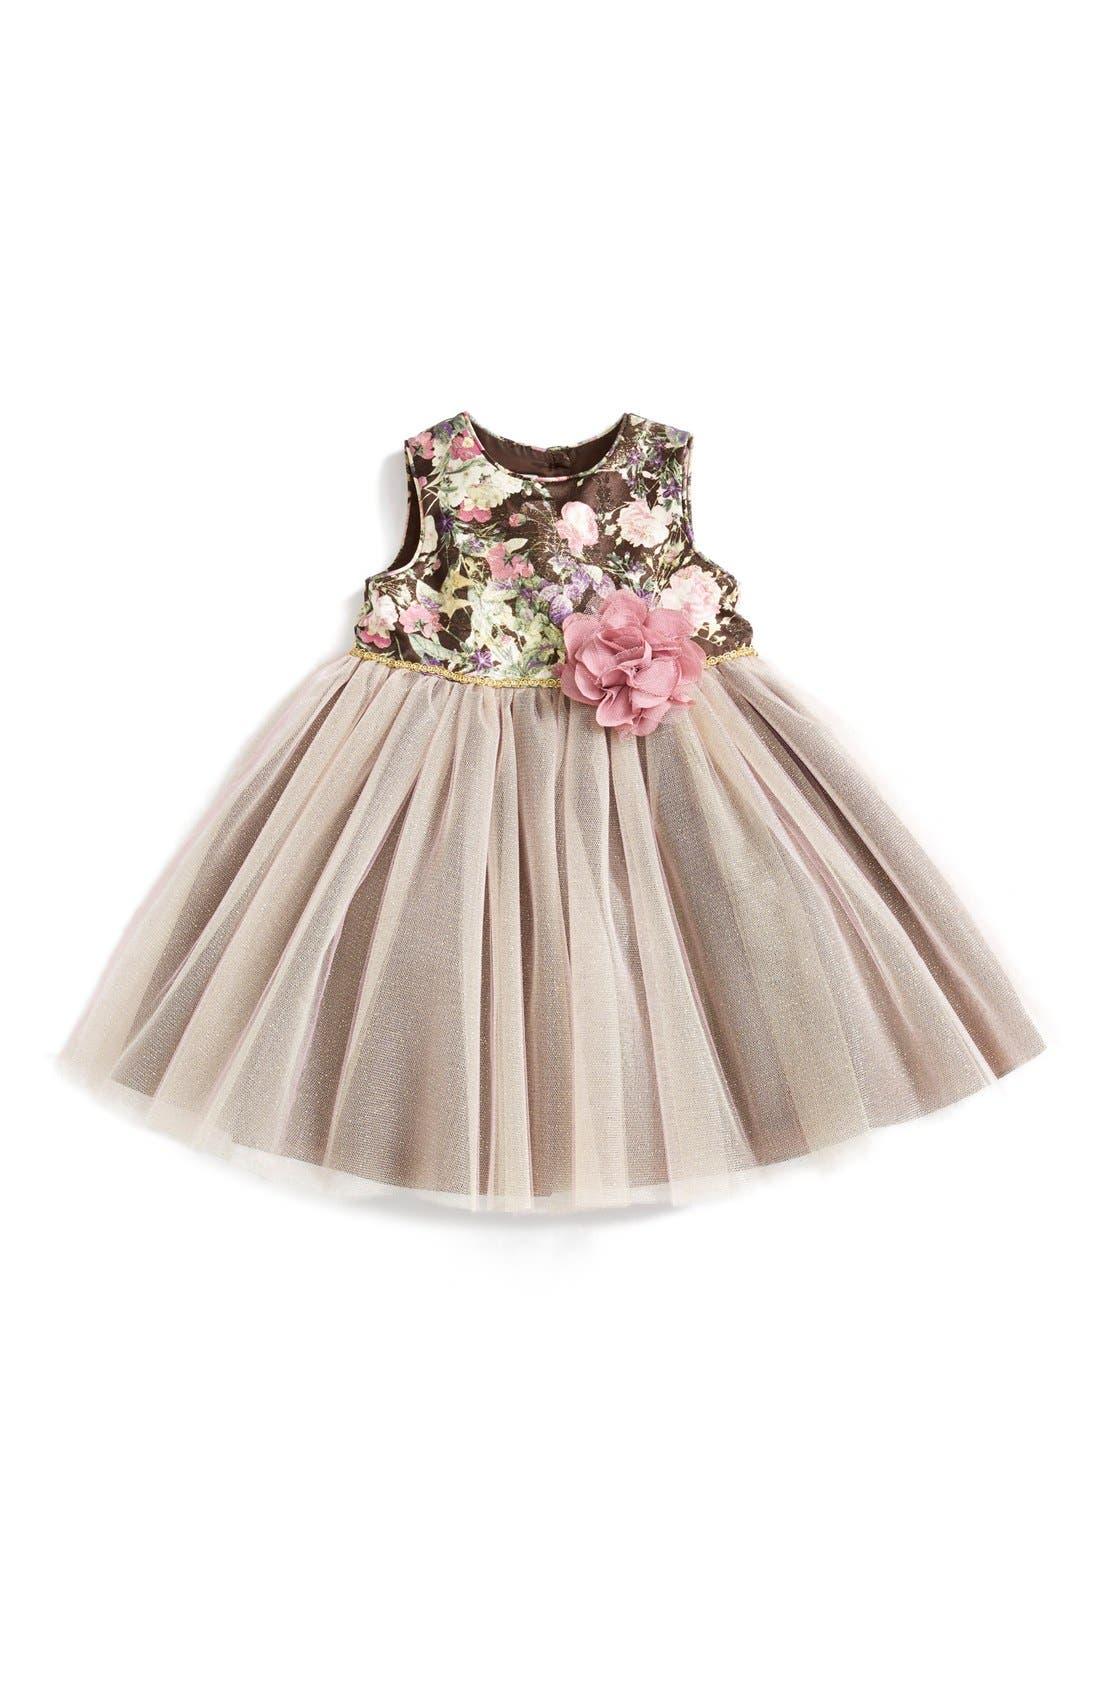 Laura Ashley Tapestry Print Tutu Dress Baby Girls